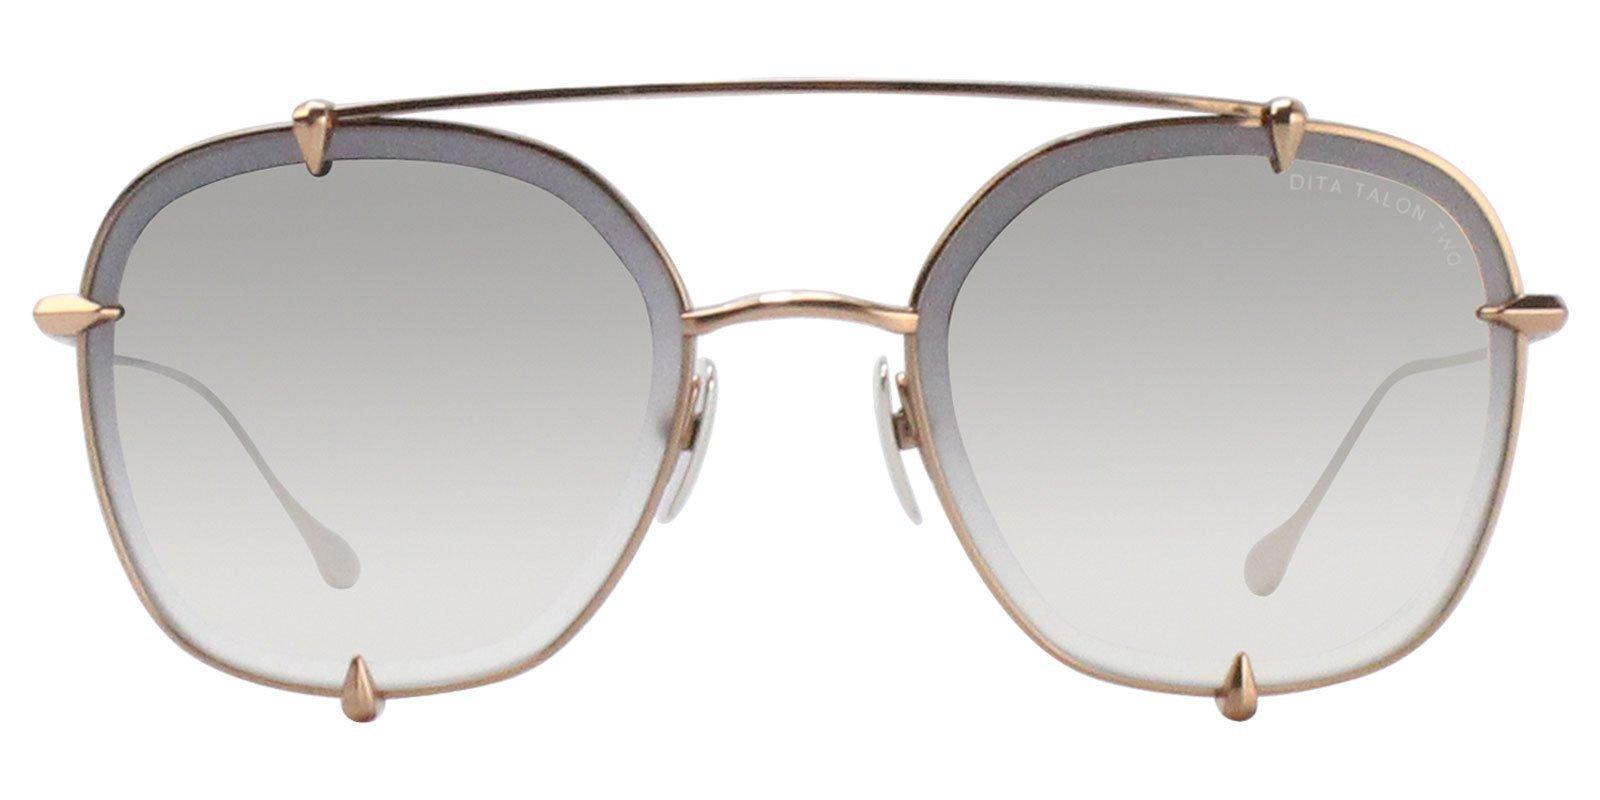 174e3e6f7e4 Dita - Talon-Two Rose Gold - Gold sunglasses